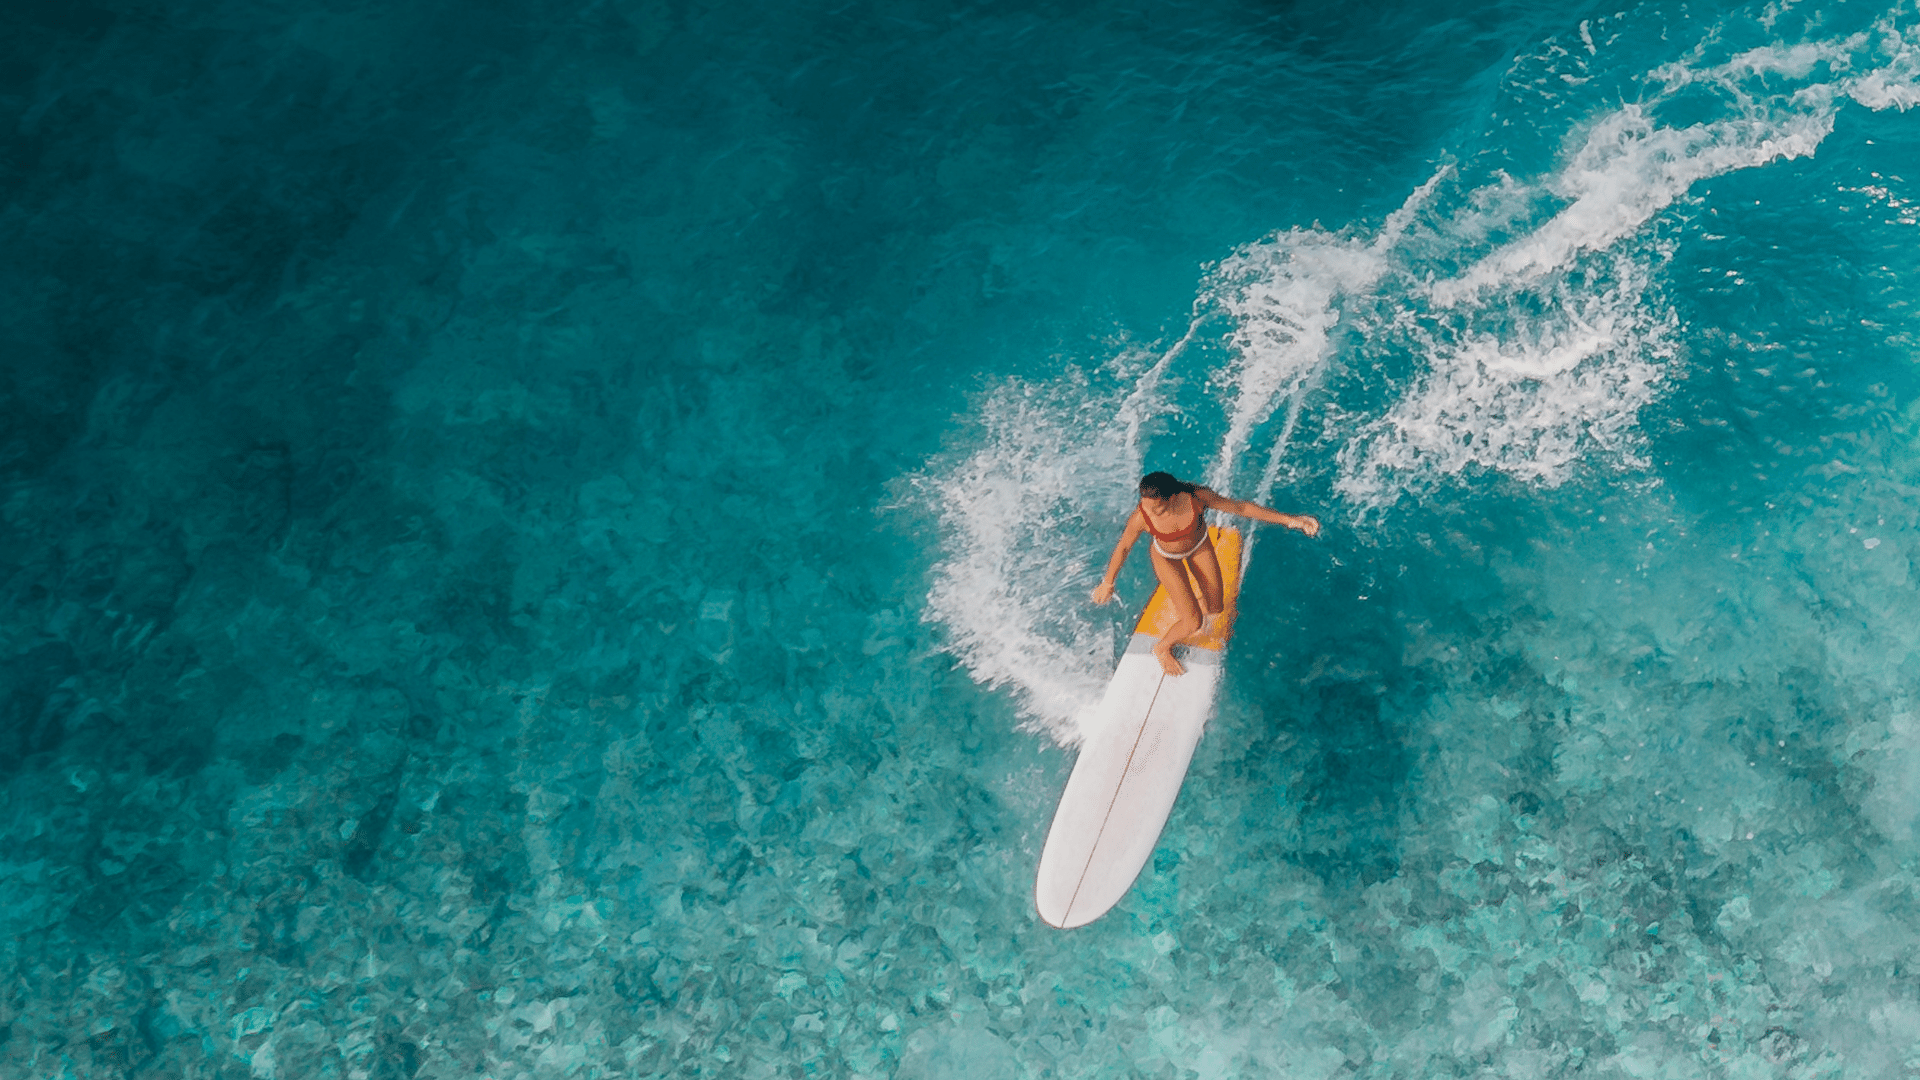 So bekommst du mehr Wellen beim Surfen mehr Wellen bekommen Take Off